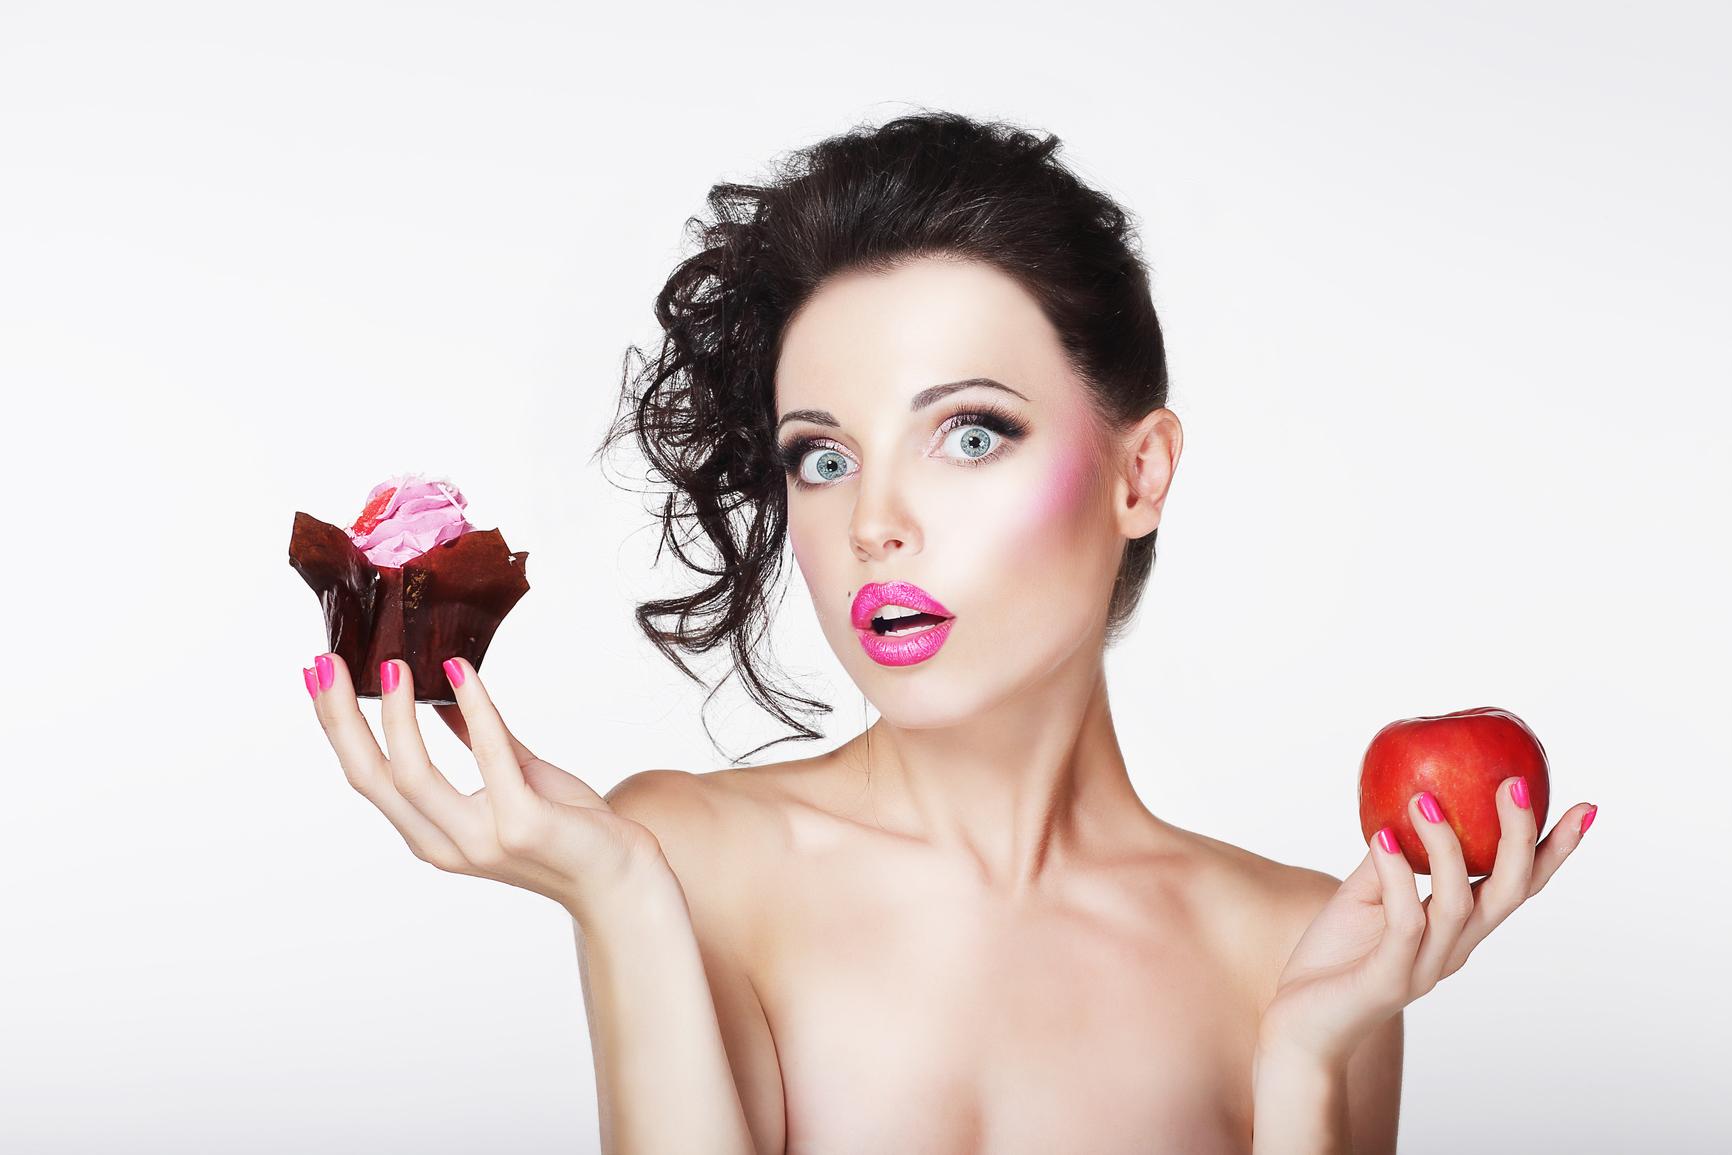 диеты от диетолога светланы фус